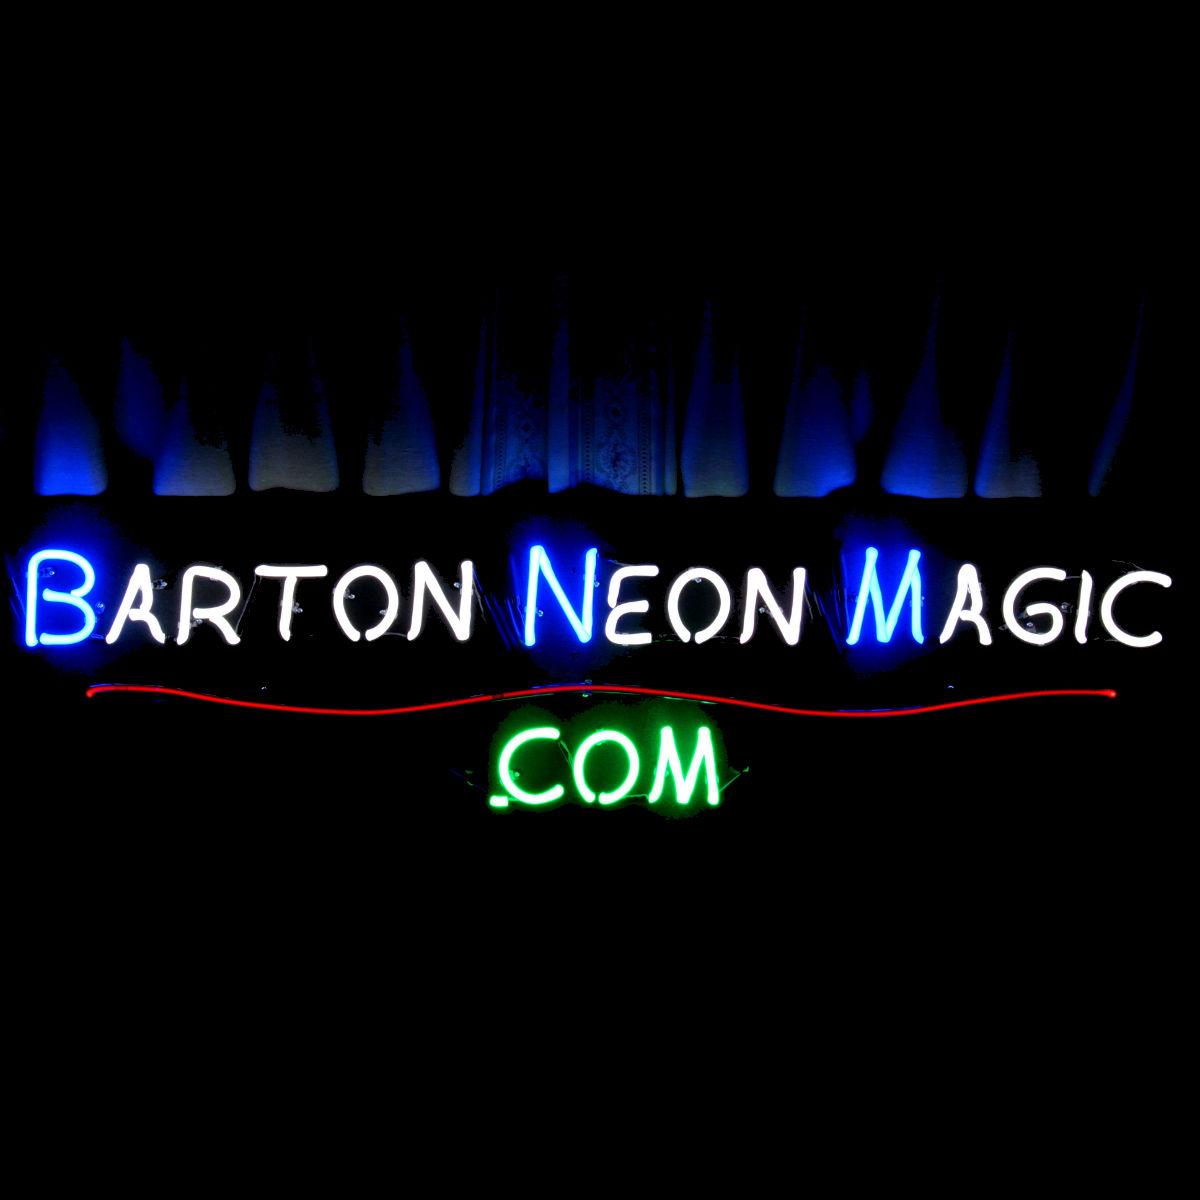 EXOTIC CAR NEON LIGHT ARTWORKS by John Barton - BartonNeonMagic.com